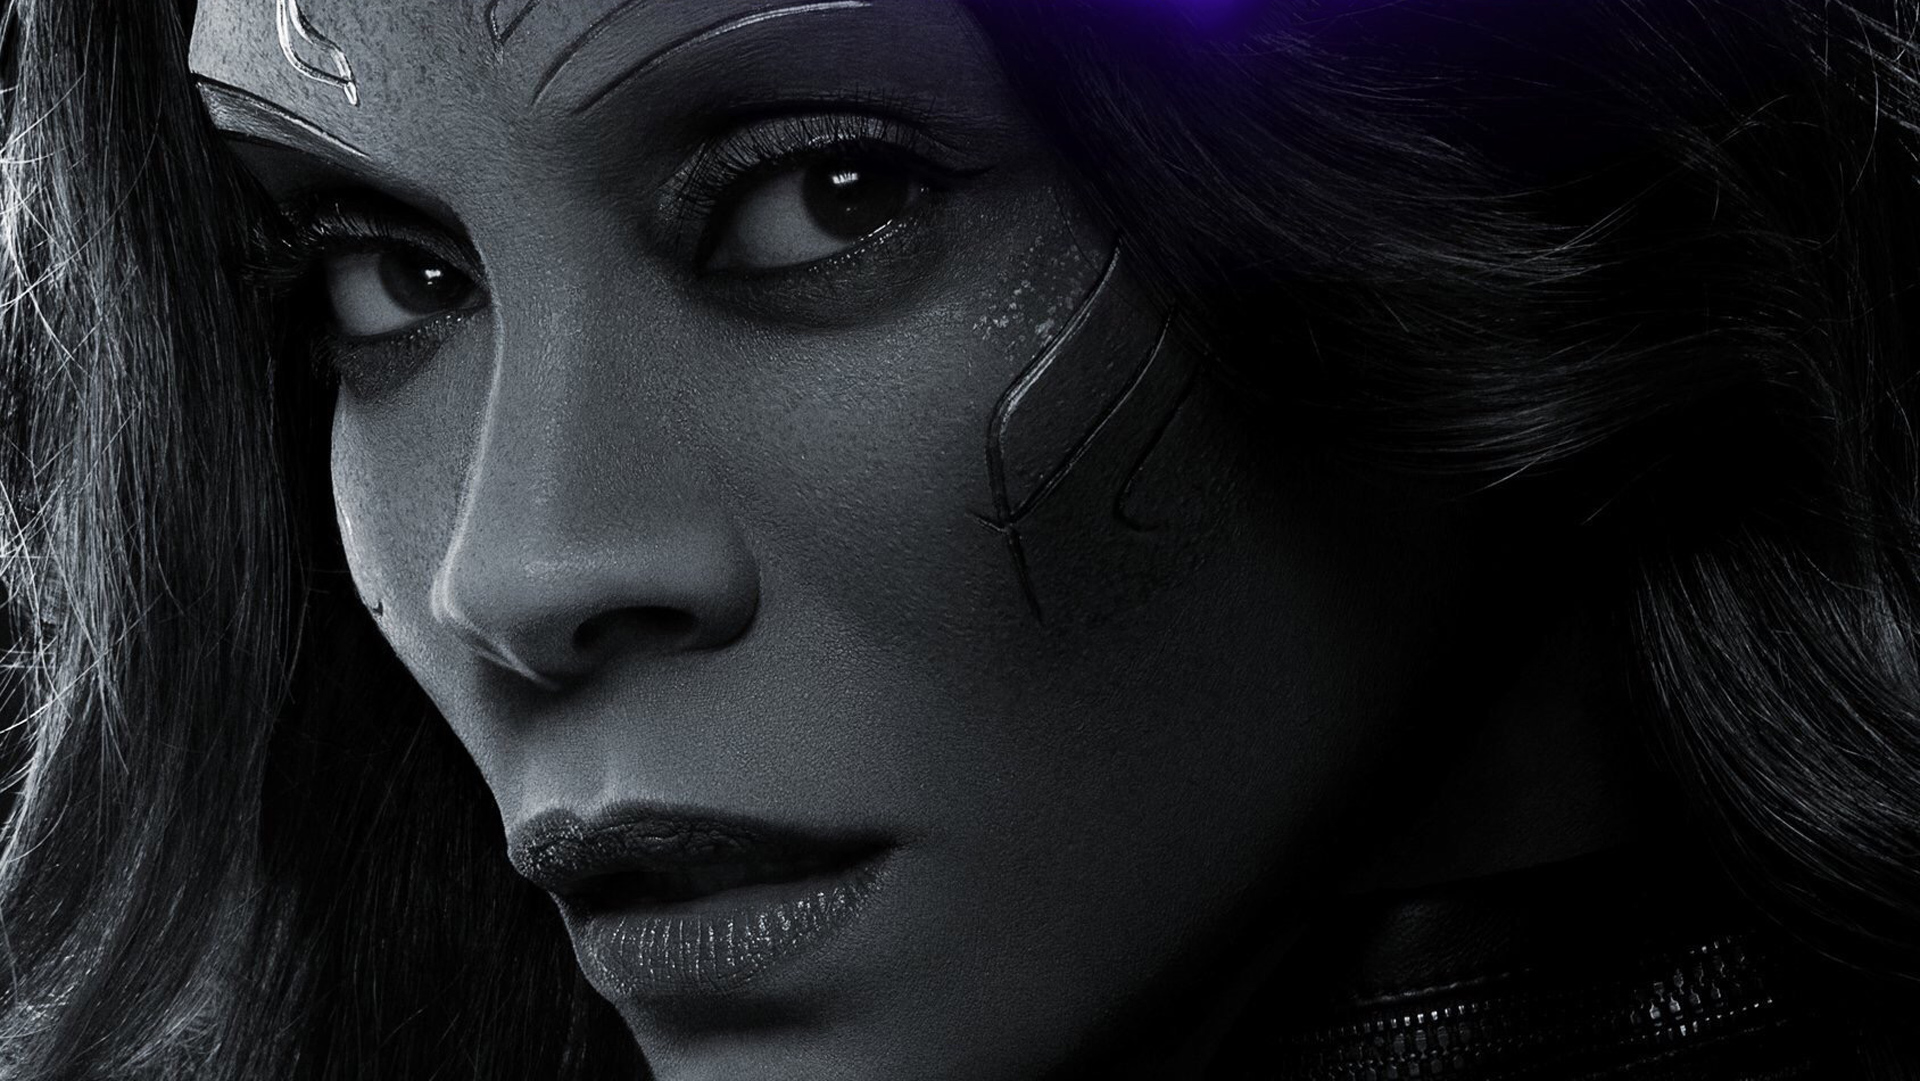 Movie Poster 2019: Gamora Avengers Endgame 2019 Poster, HD Movies, 4k